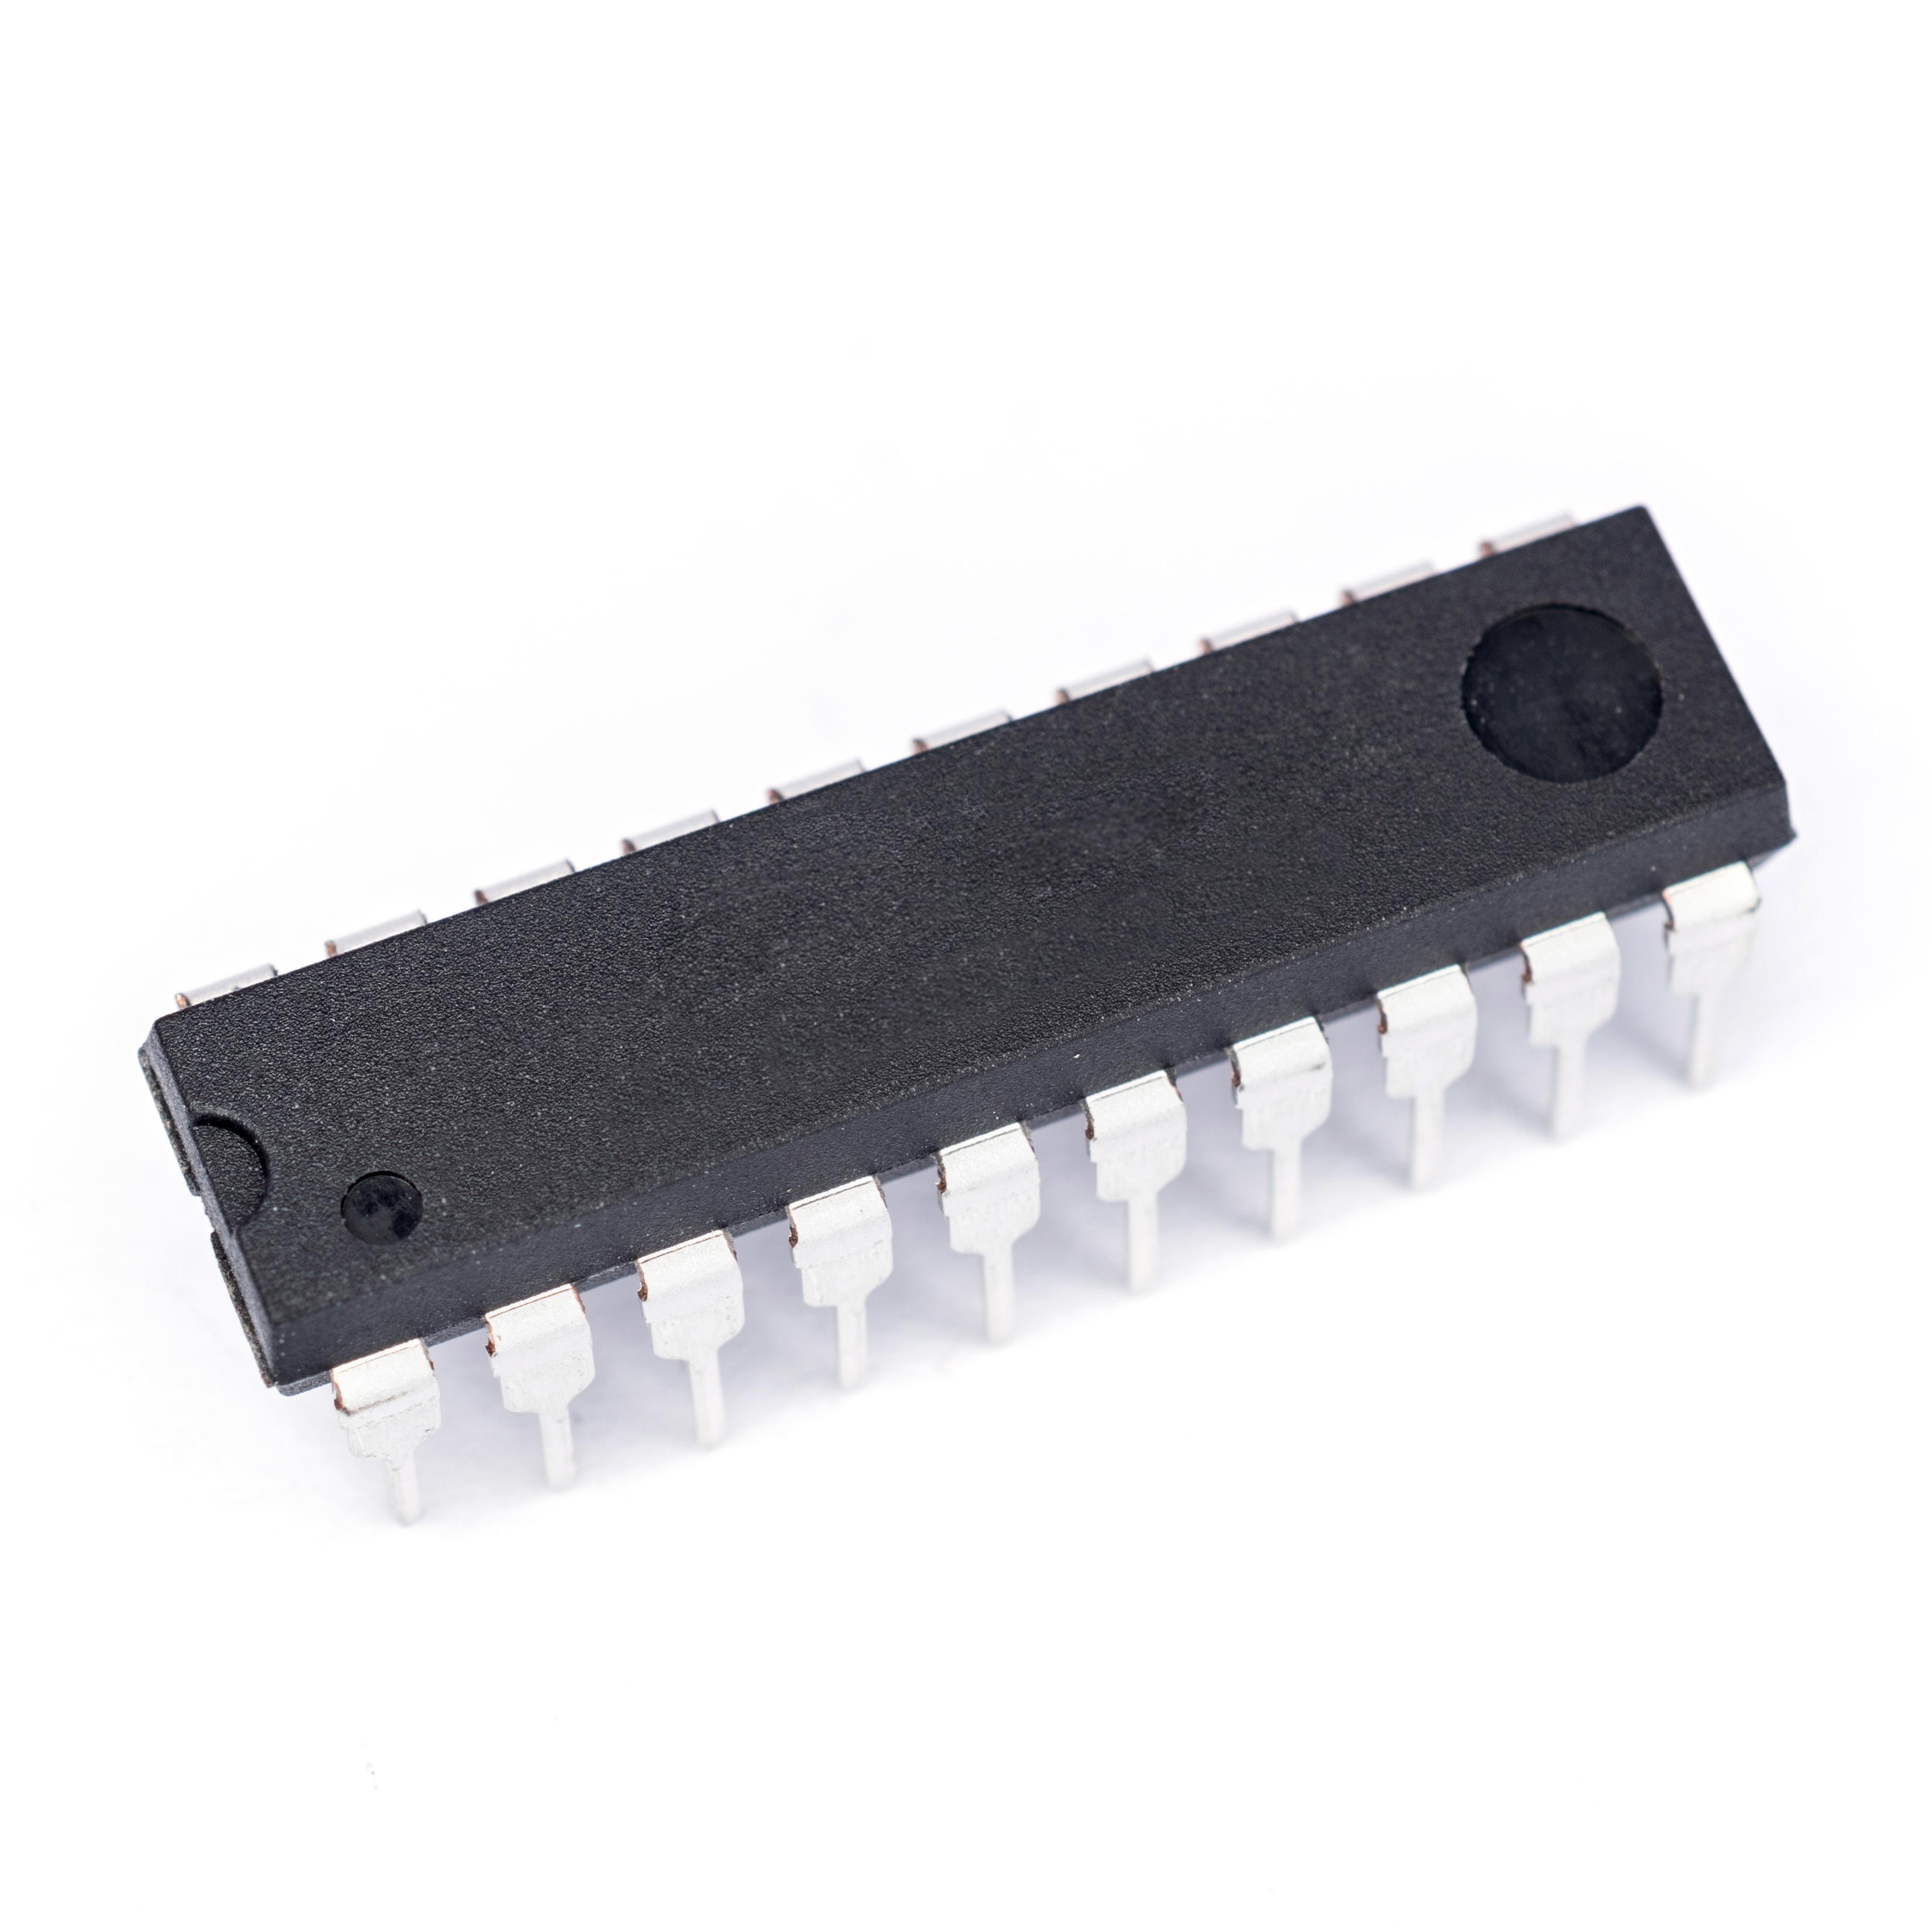 Buy Low Frequency Amplifiers Audio Amplifier Circuit Using Tda7231 Tda7496l